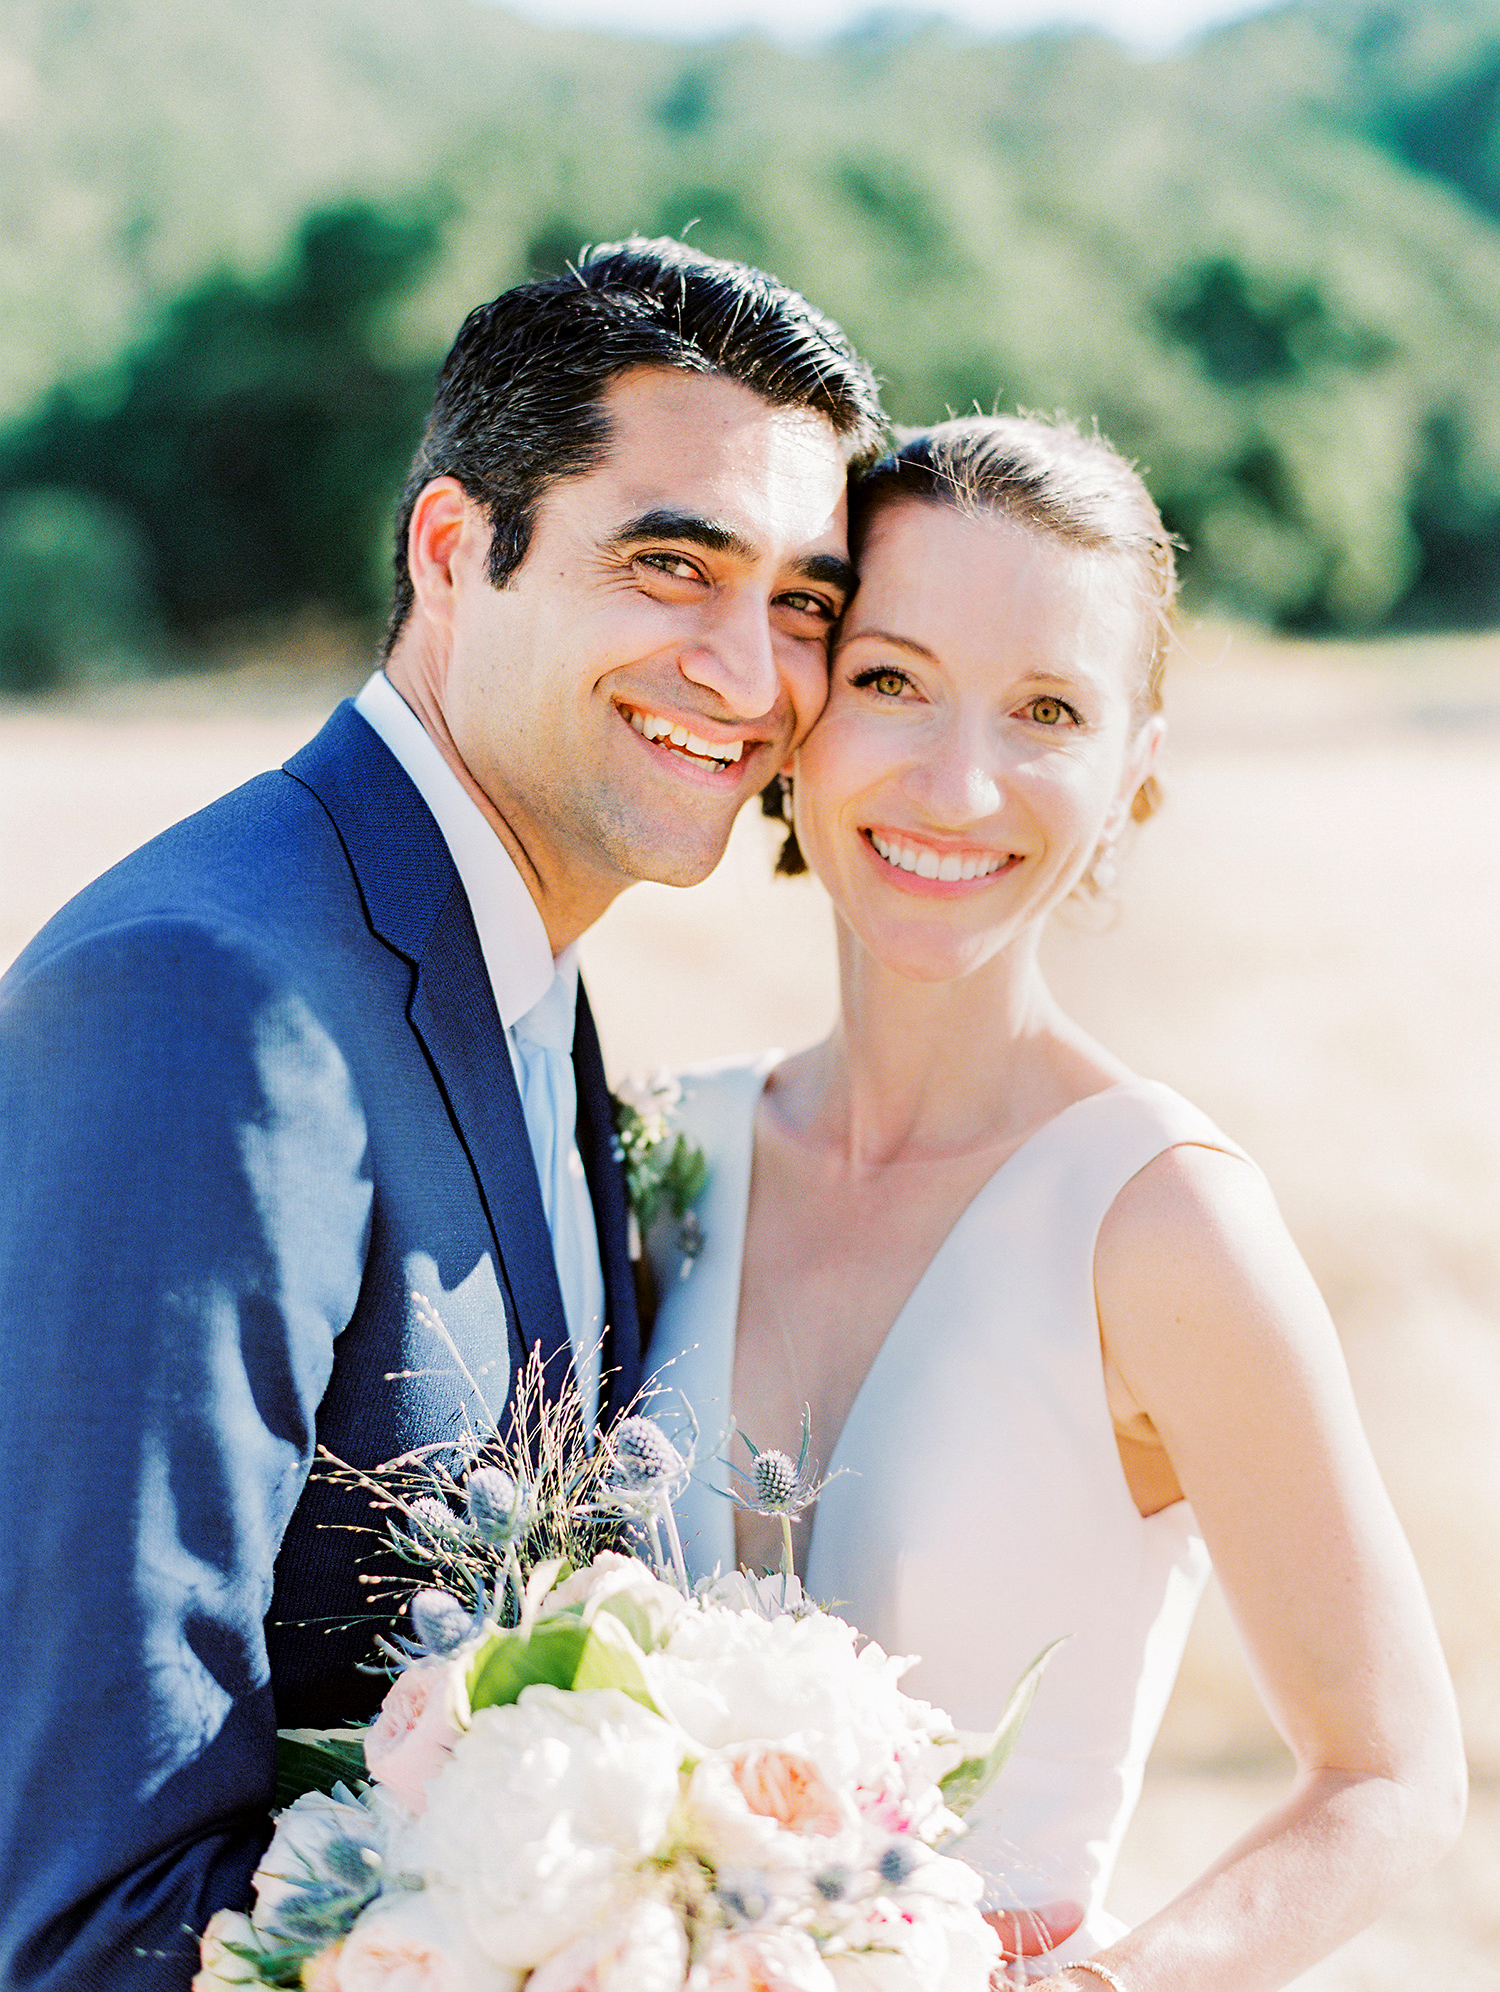 caitlin amit wedding couple outdoor portrait